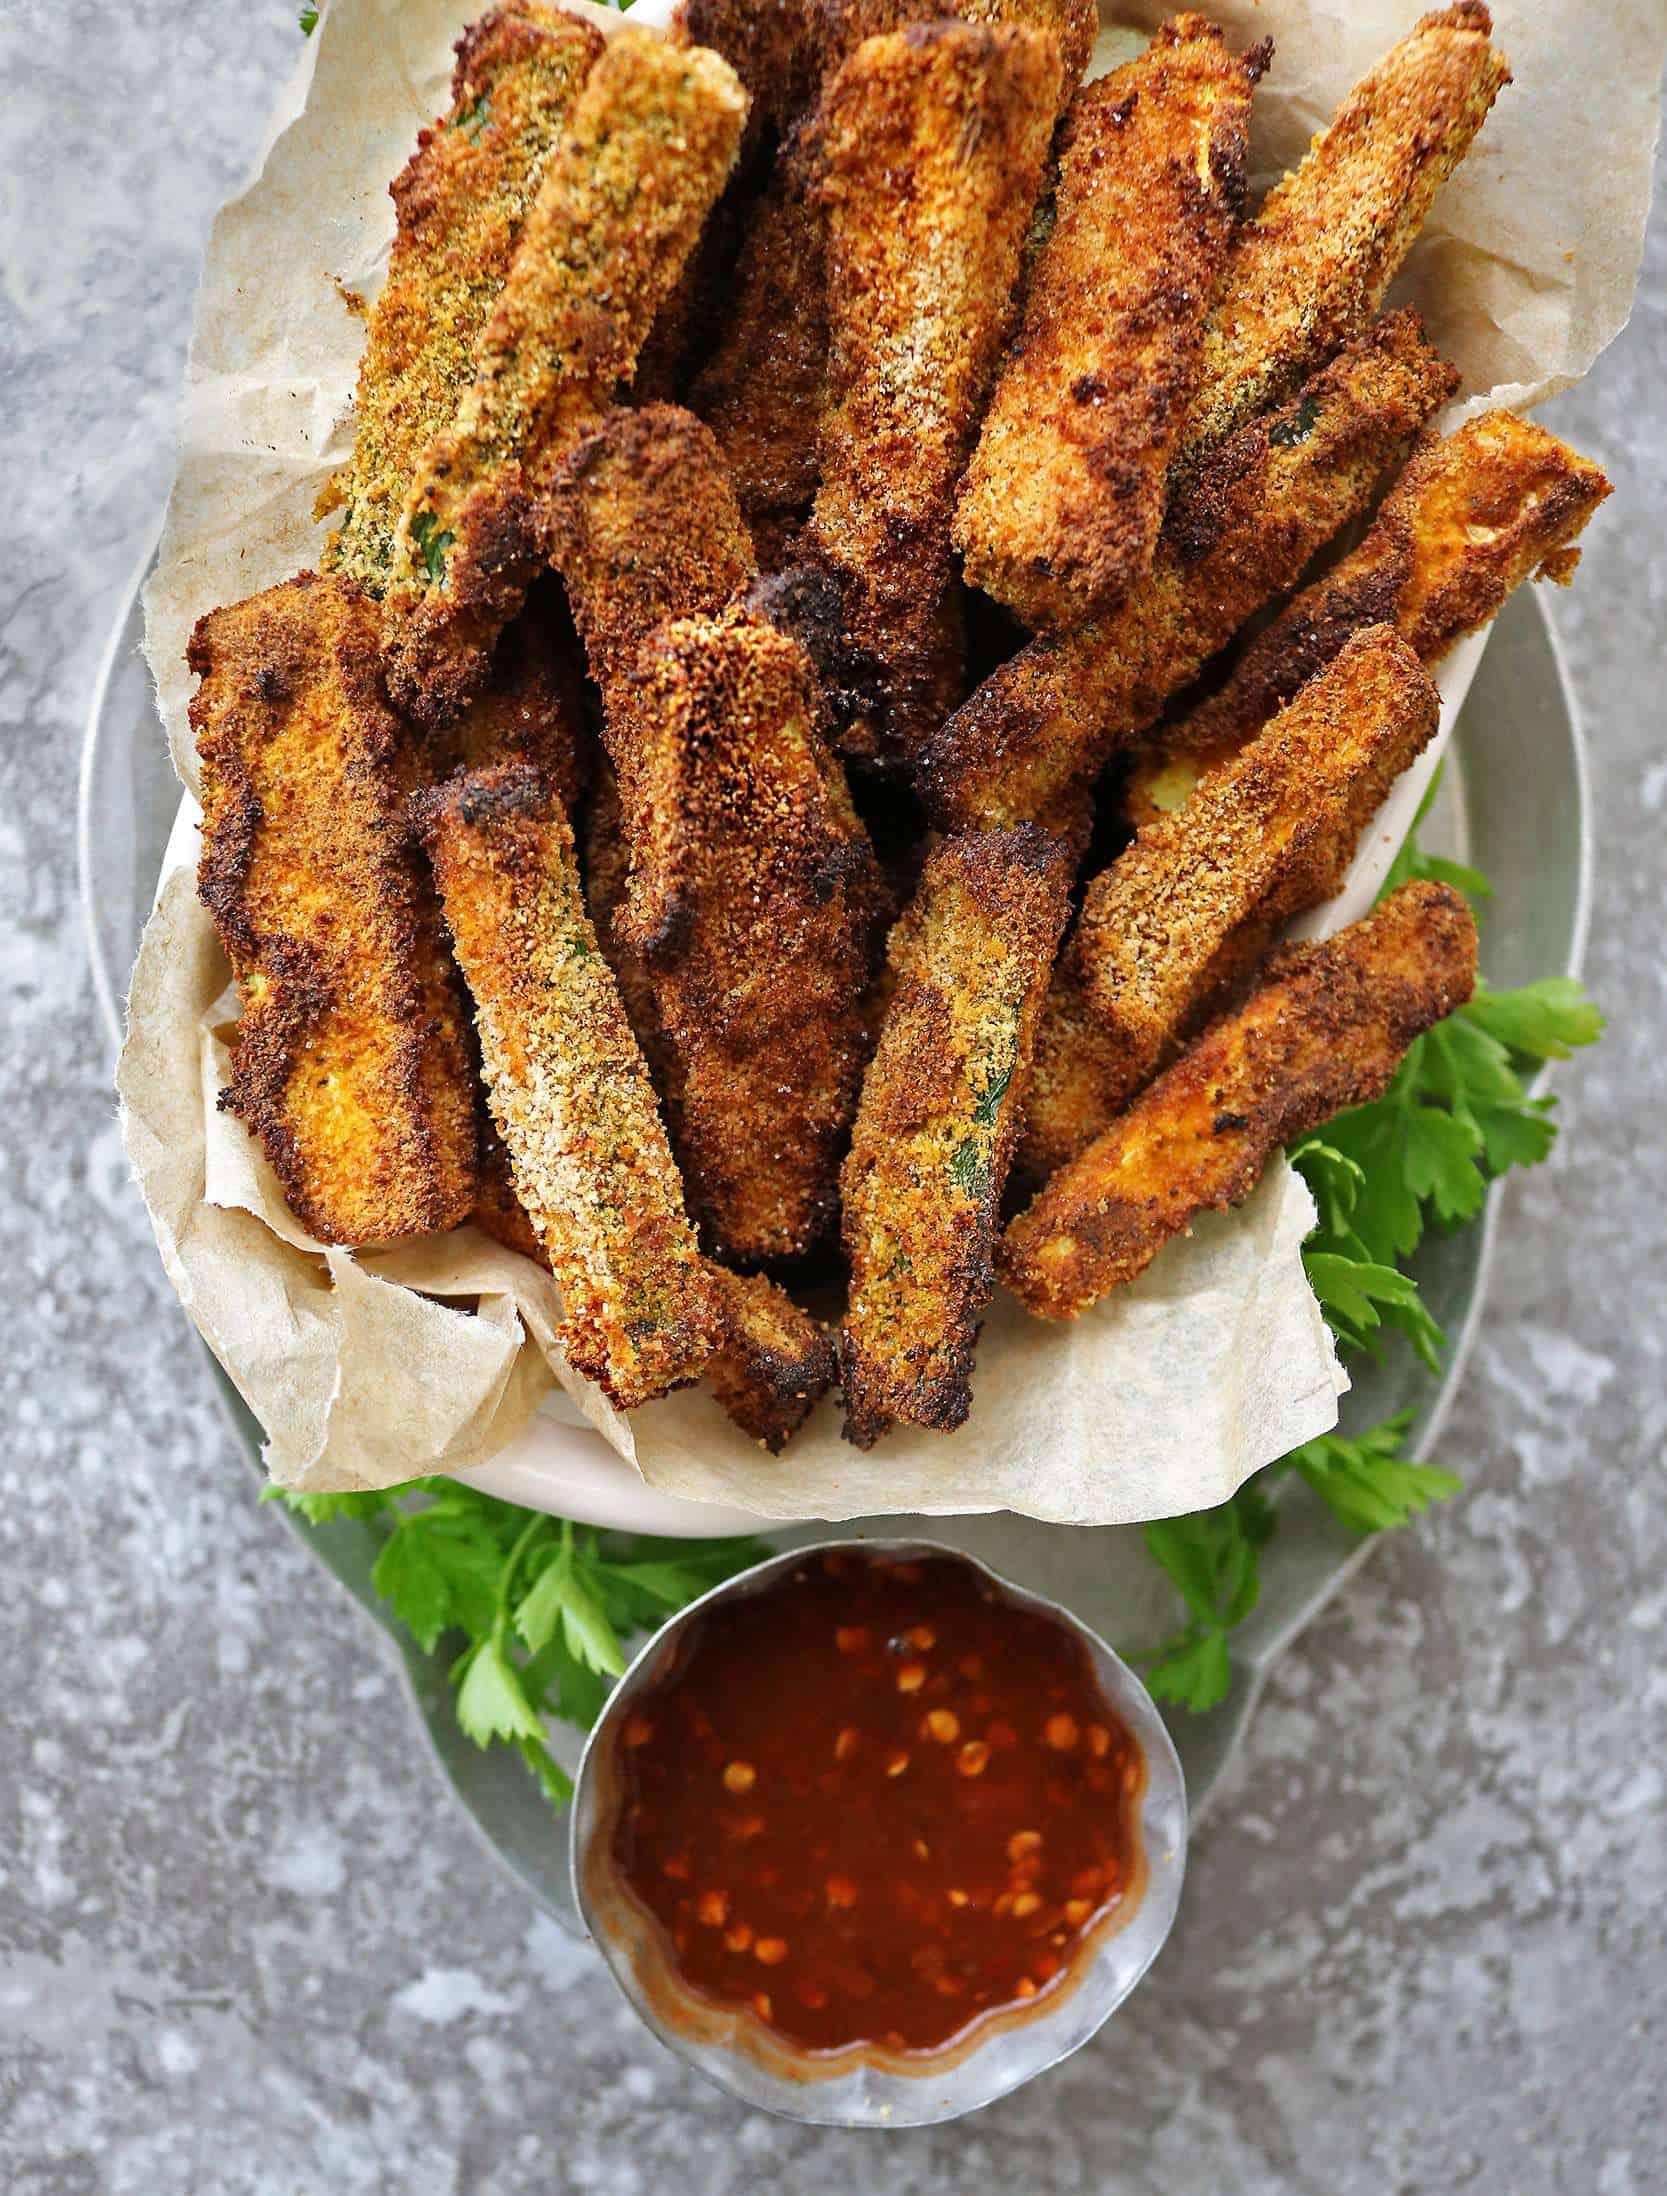 Gluten Free Air Fryer Zucchini Fries on a tray.